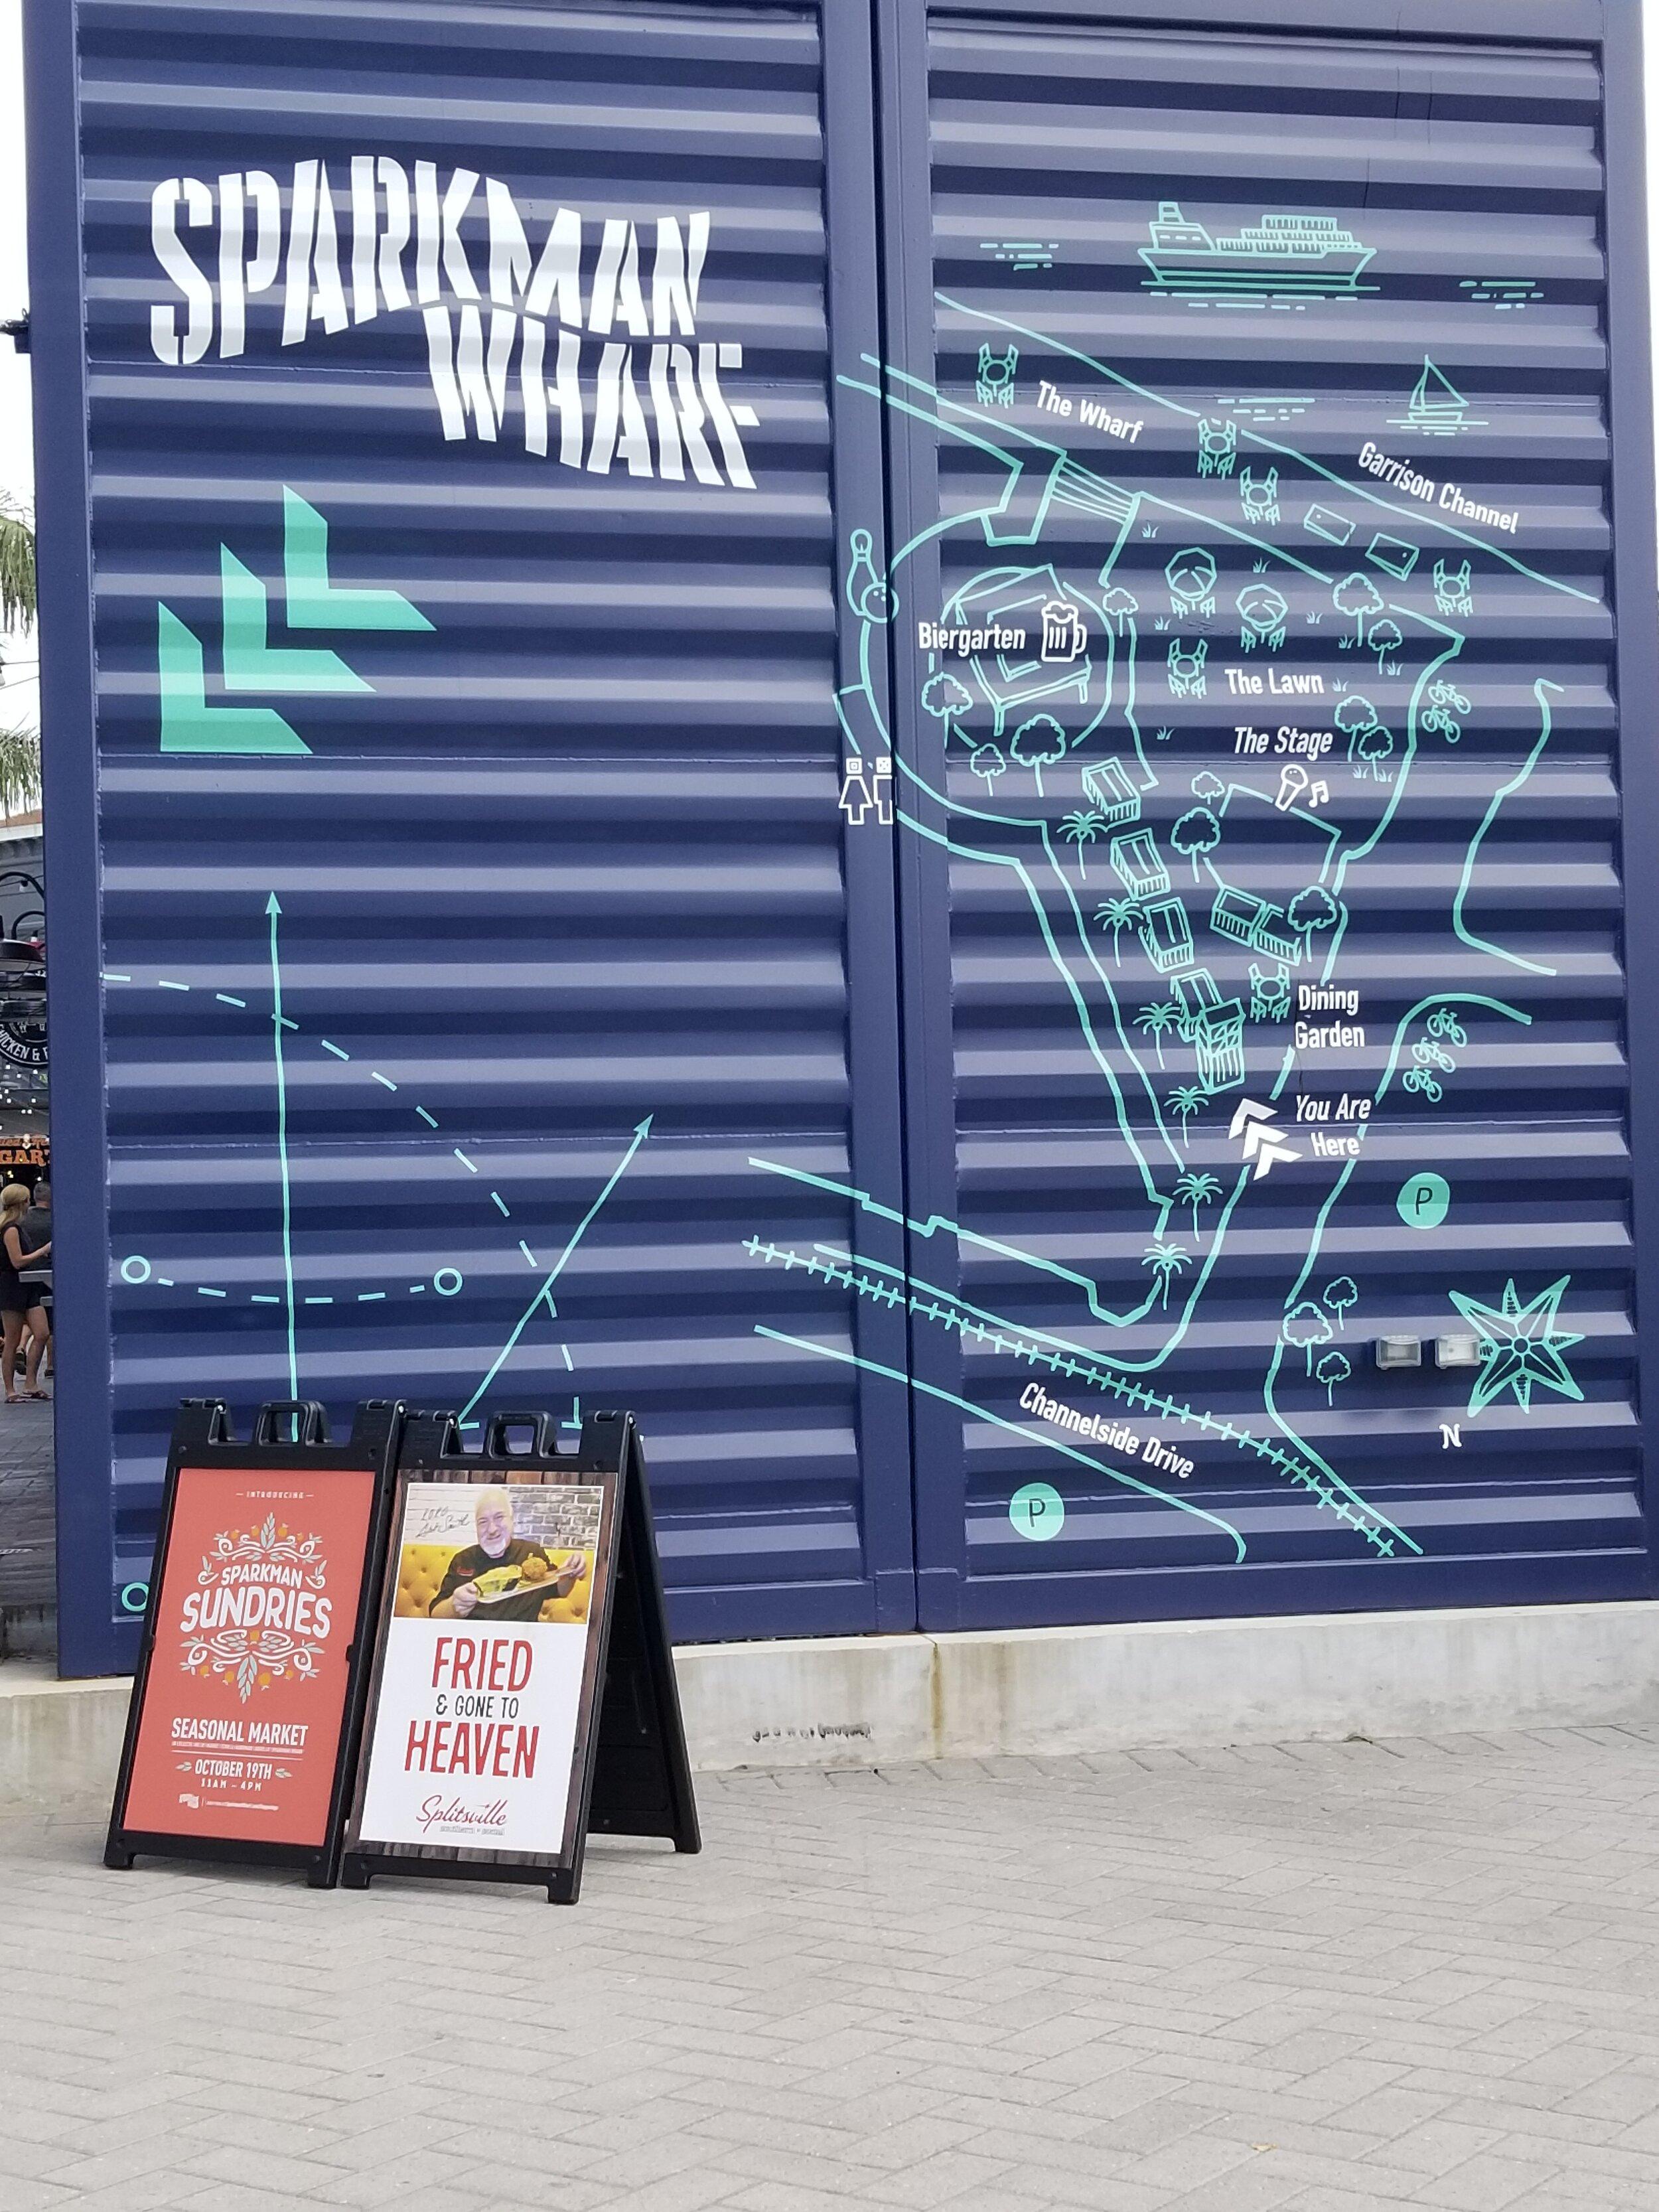 Sparkman Wharf Sign